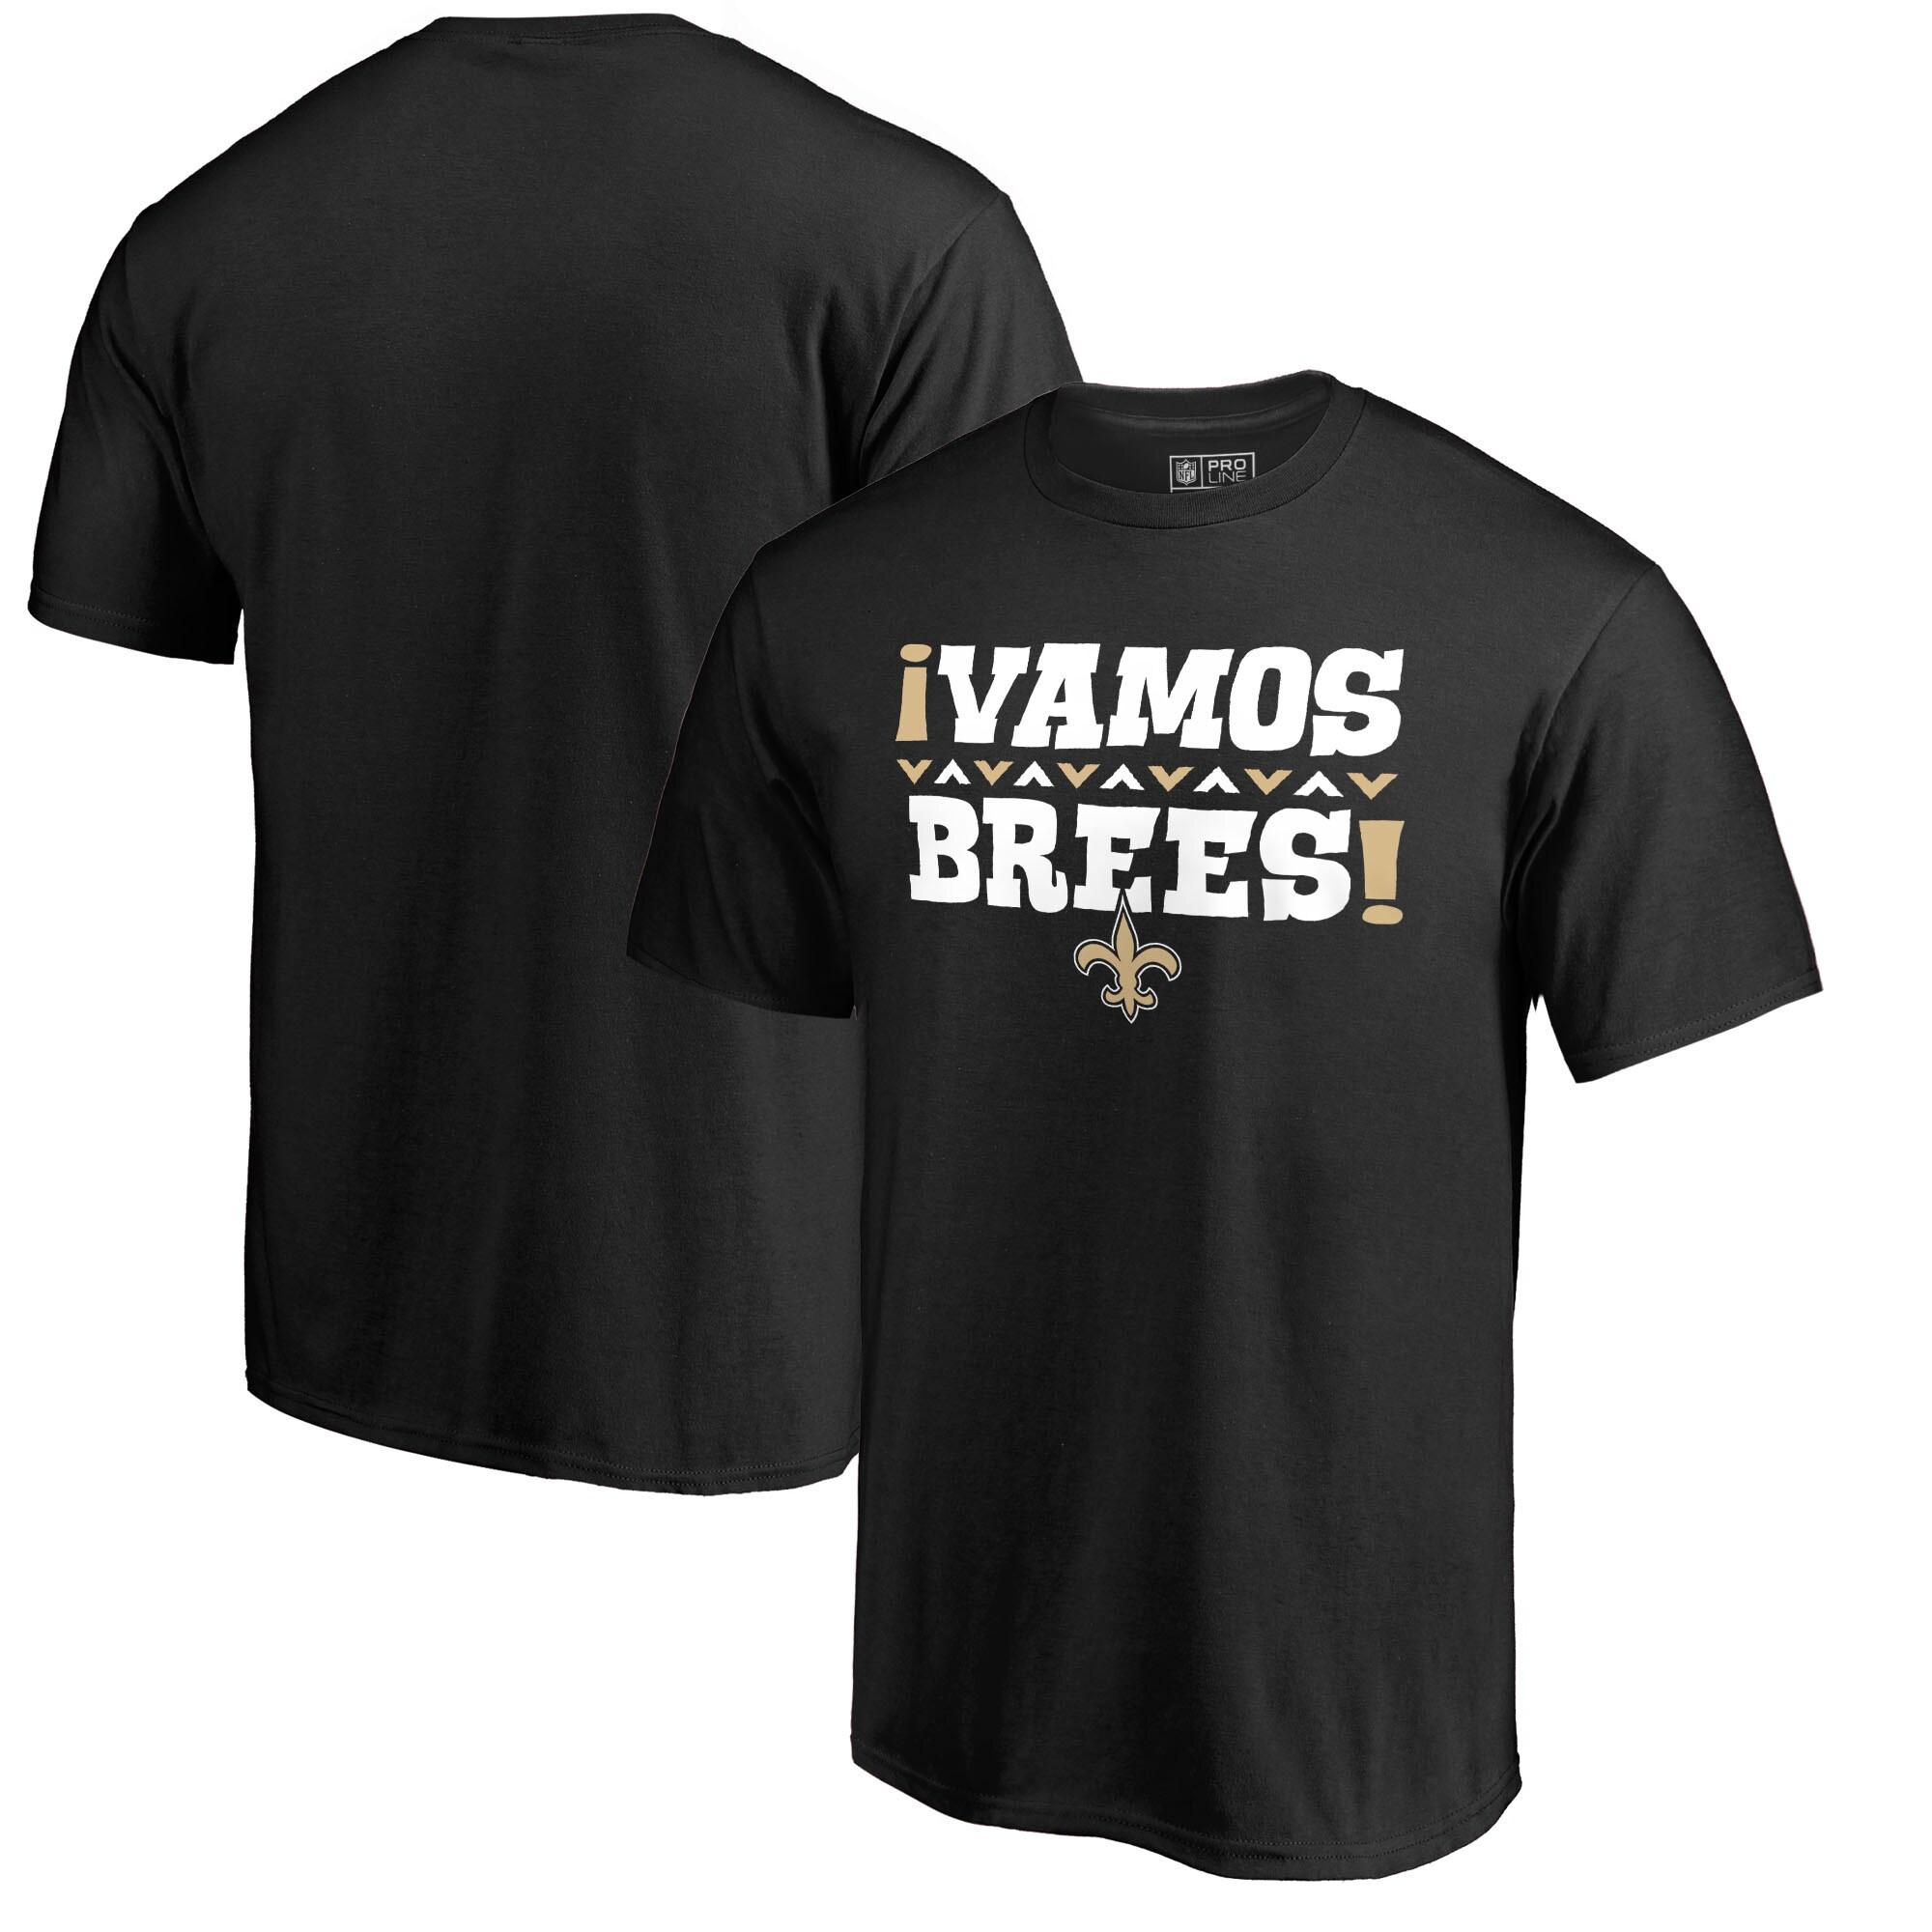 Drew Brees New Orleans Saints NFL Pro Line by Fanatics Branded Vamos T-Shirt - Black